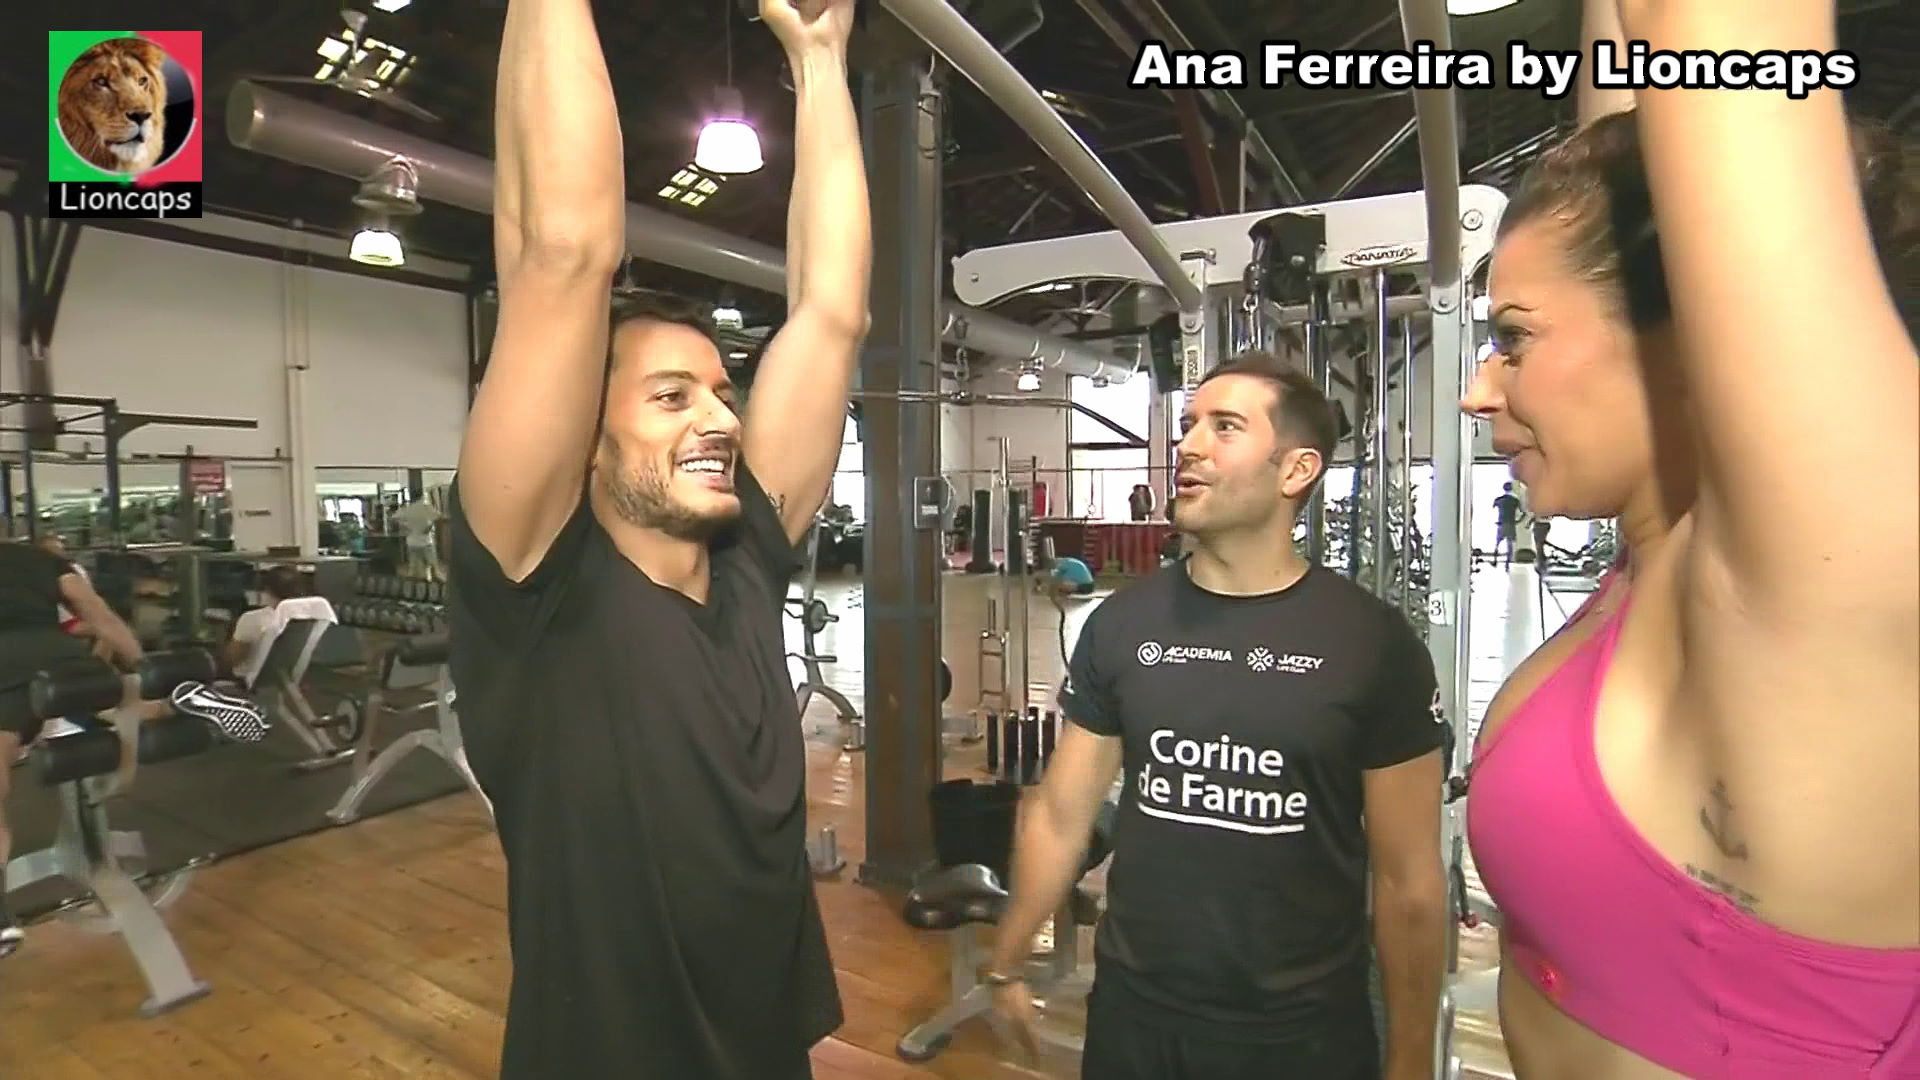 263815044_ana_ferreira_vs200225_07514_122_86lo.JPG